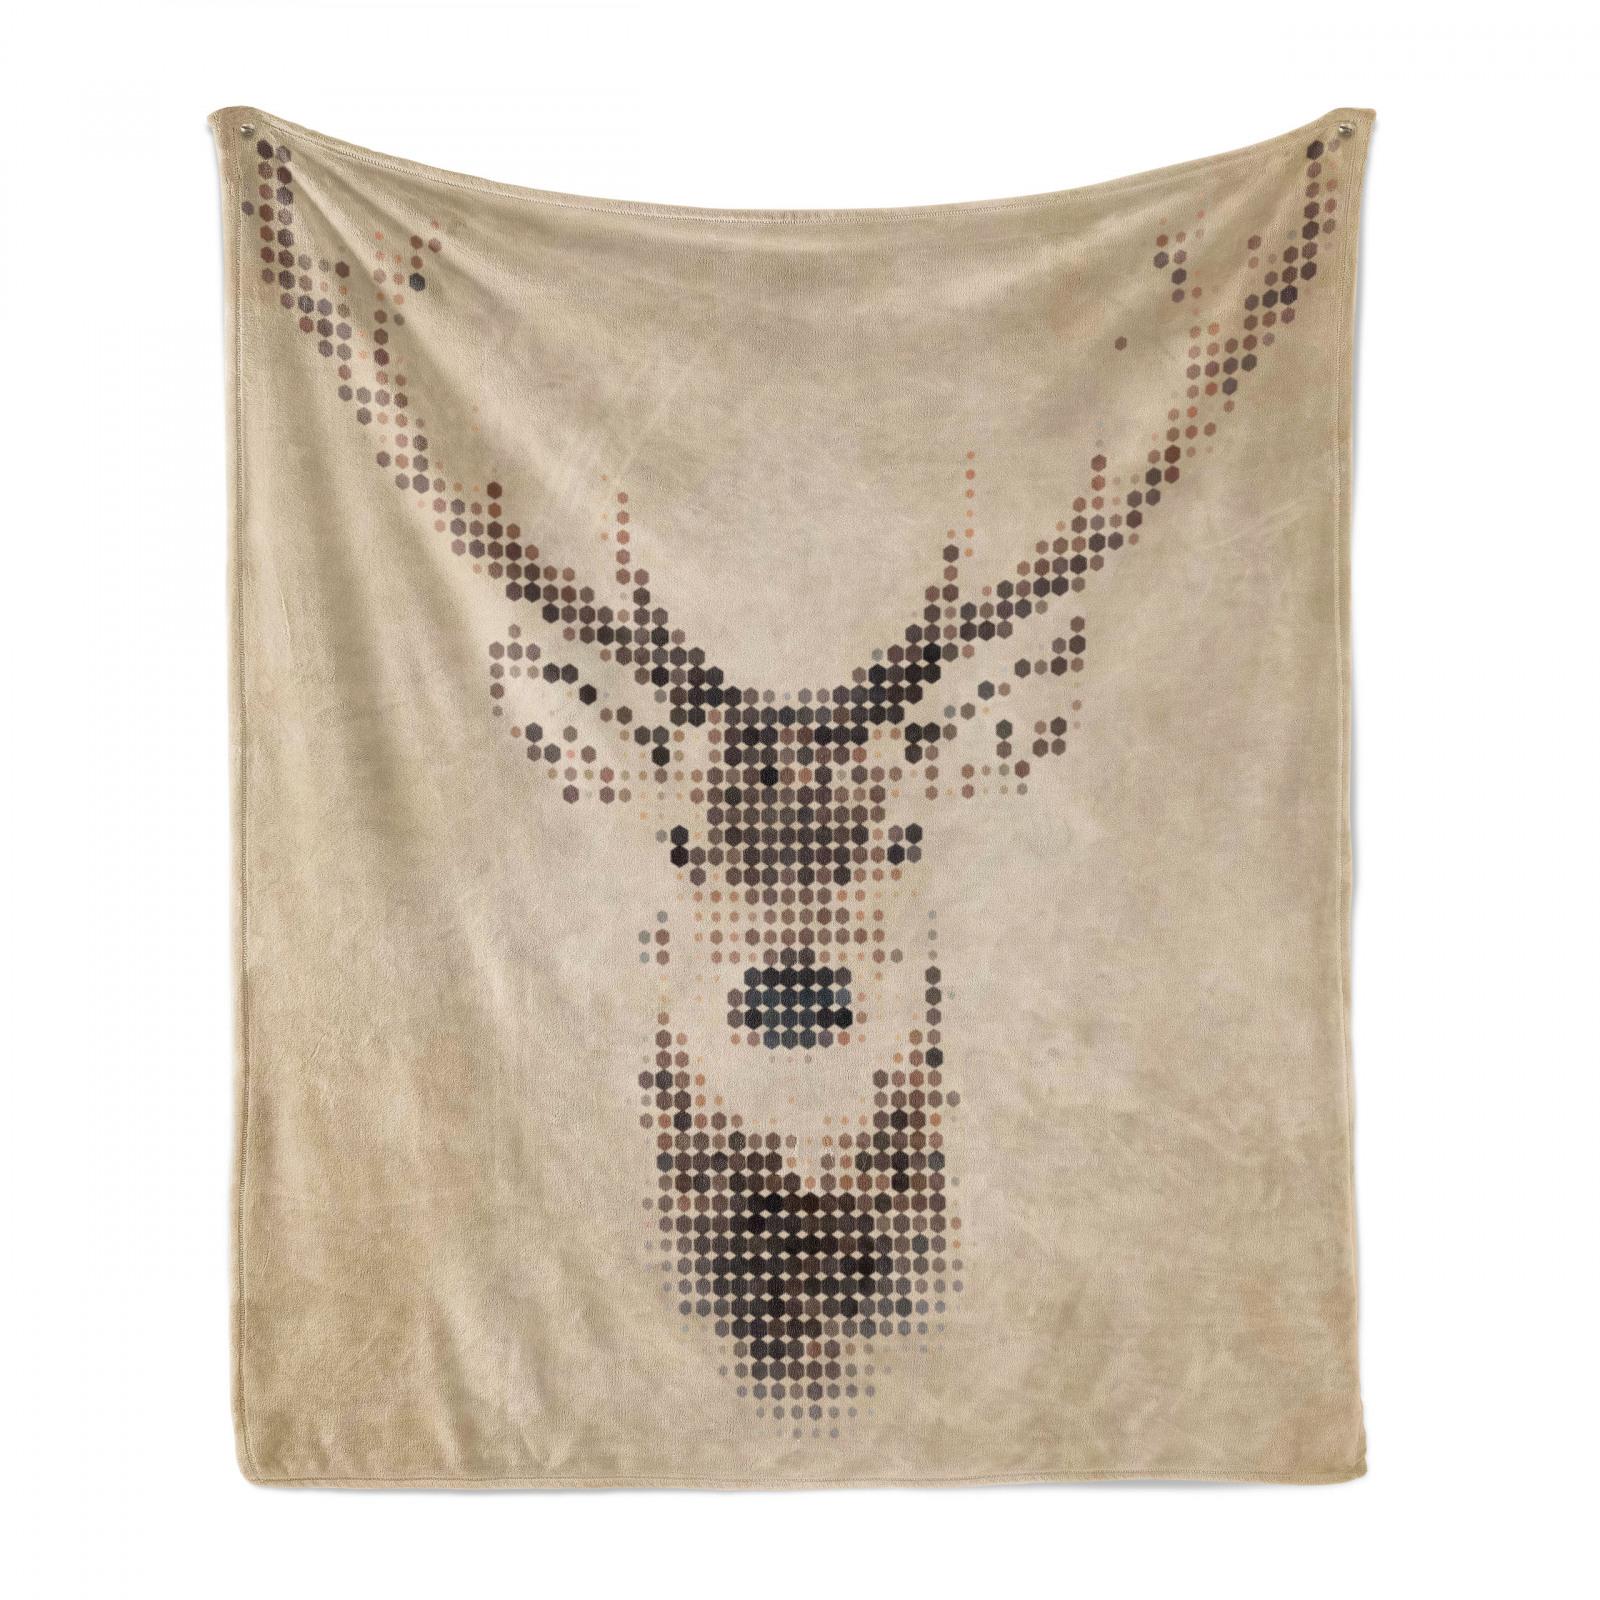 Hirsch Weich Flanell Fleece Decke Deer Portrait mit Punkten